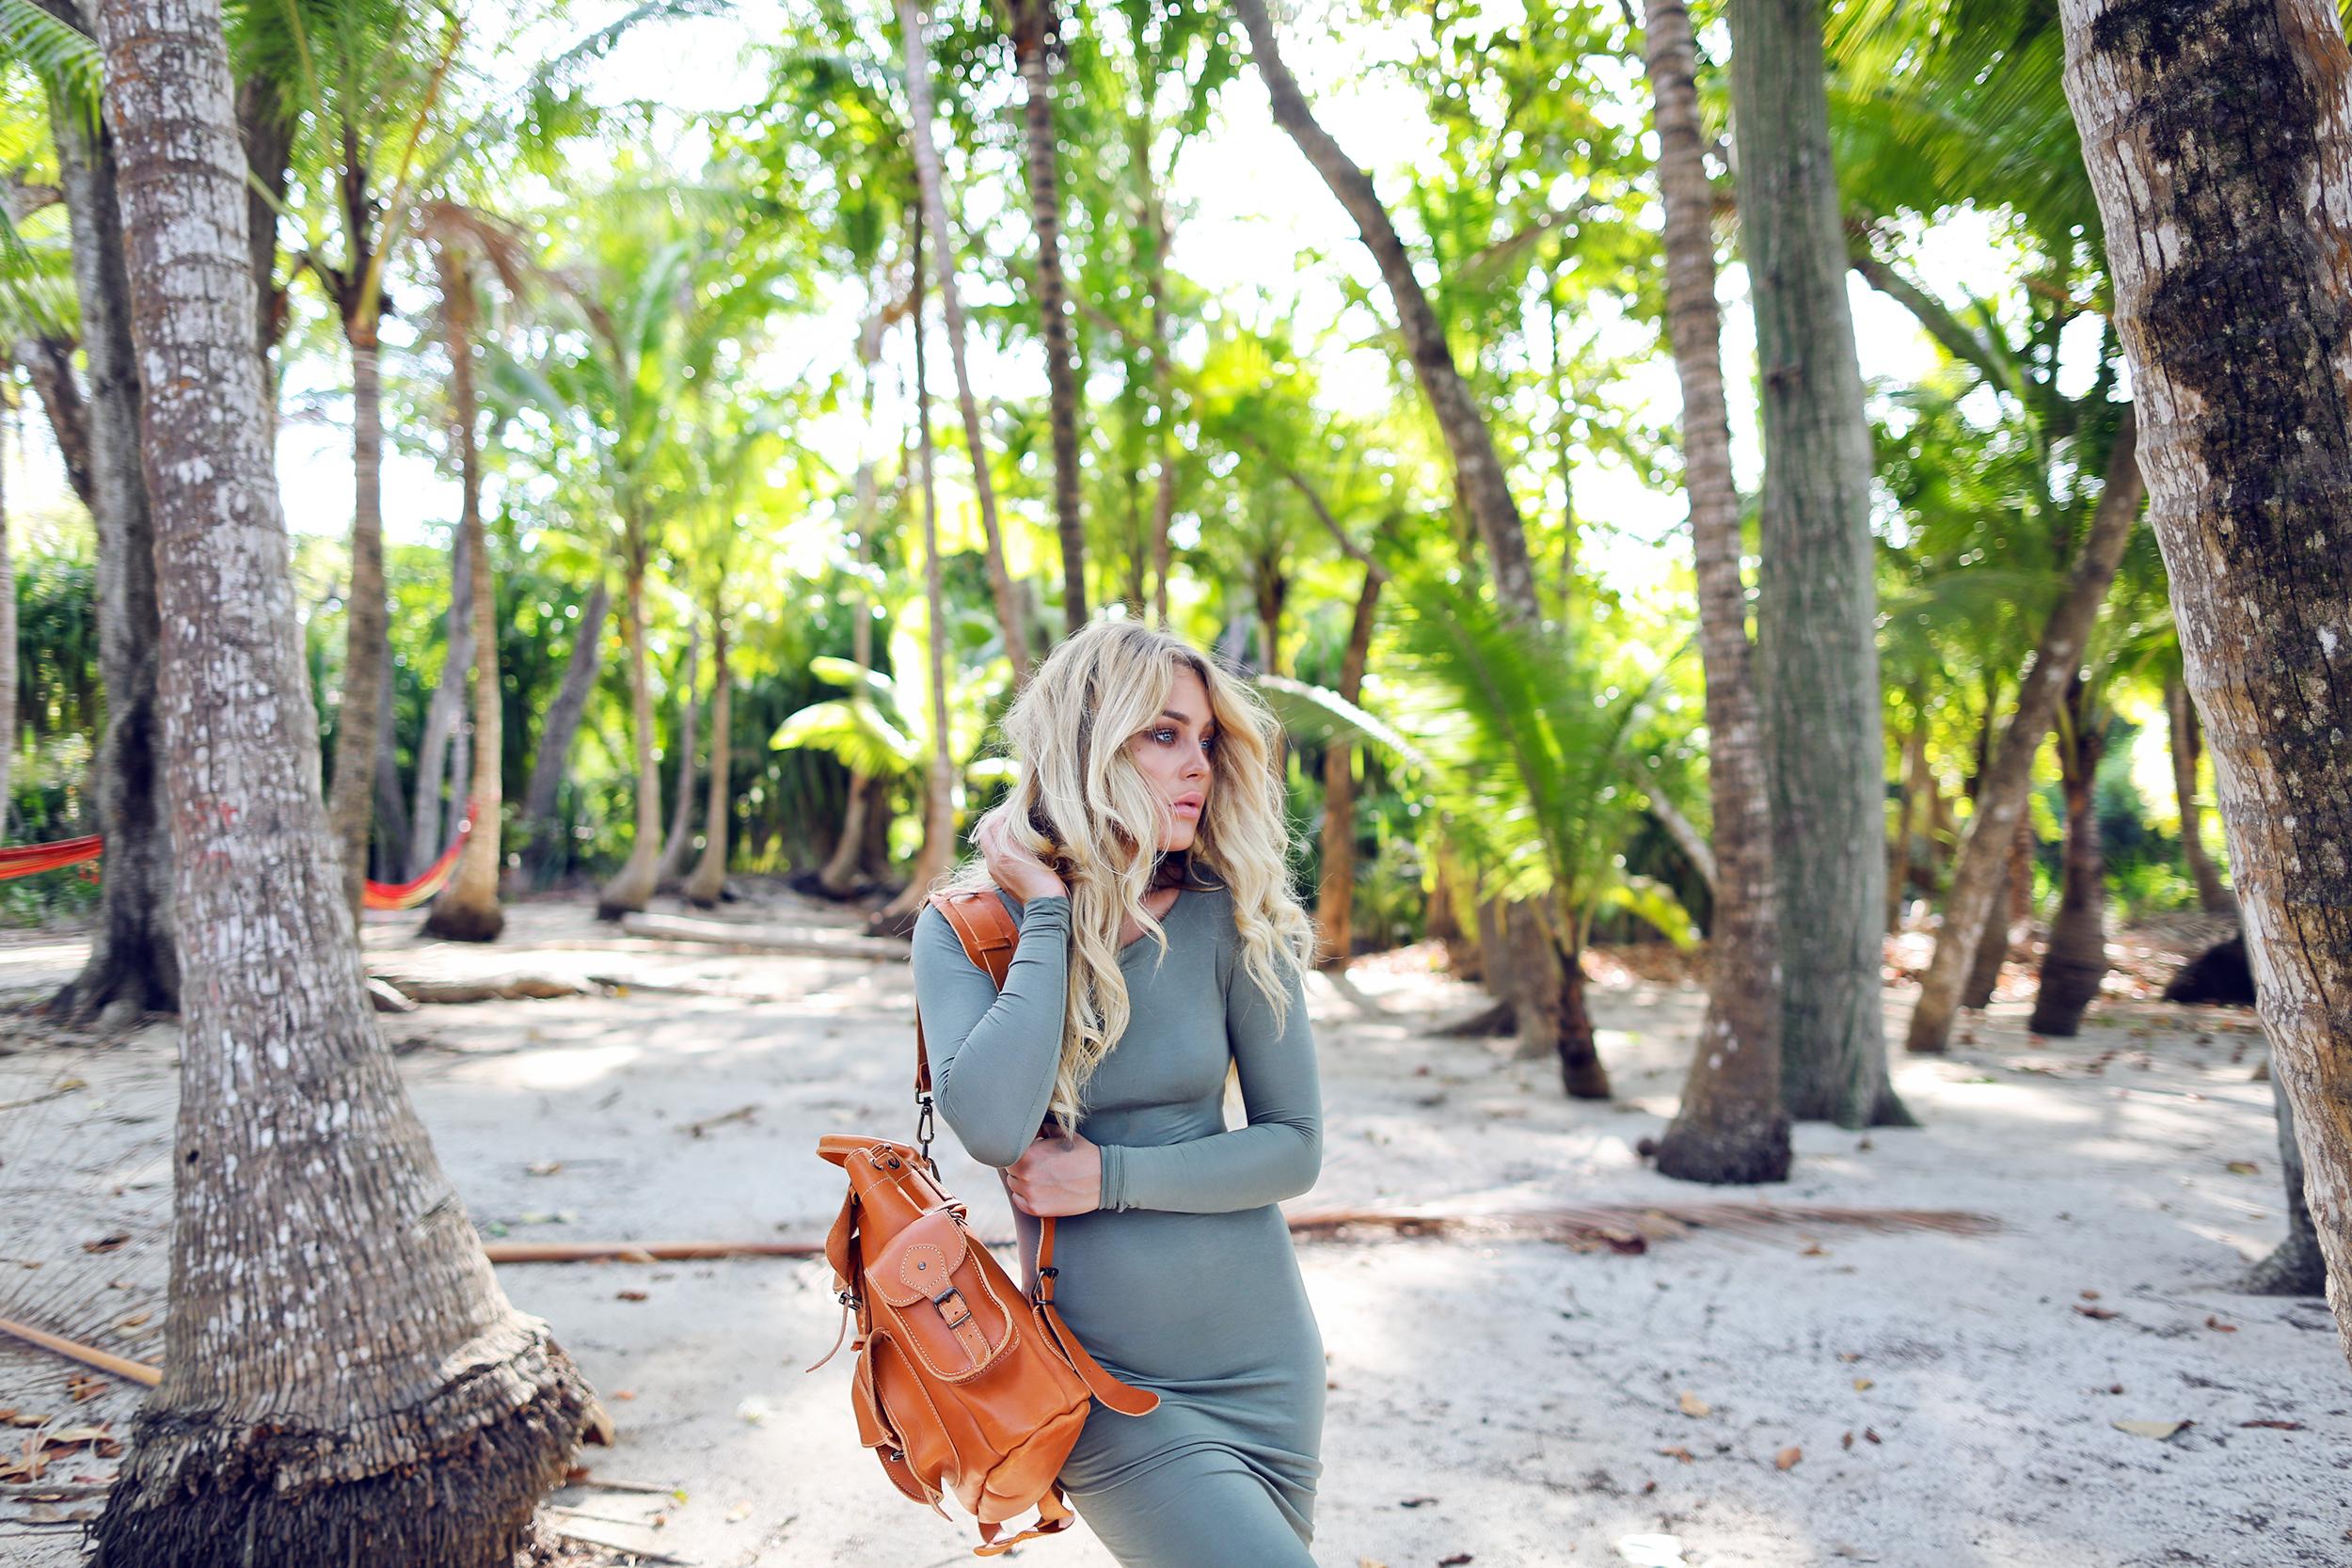 palmtrees_blick4